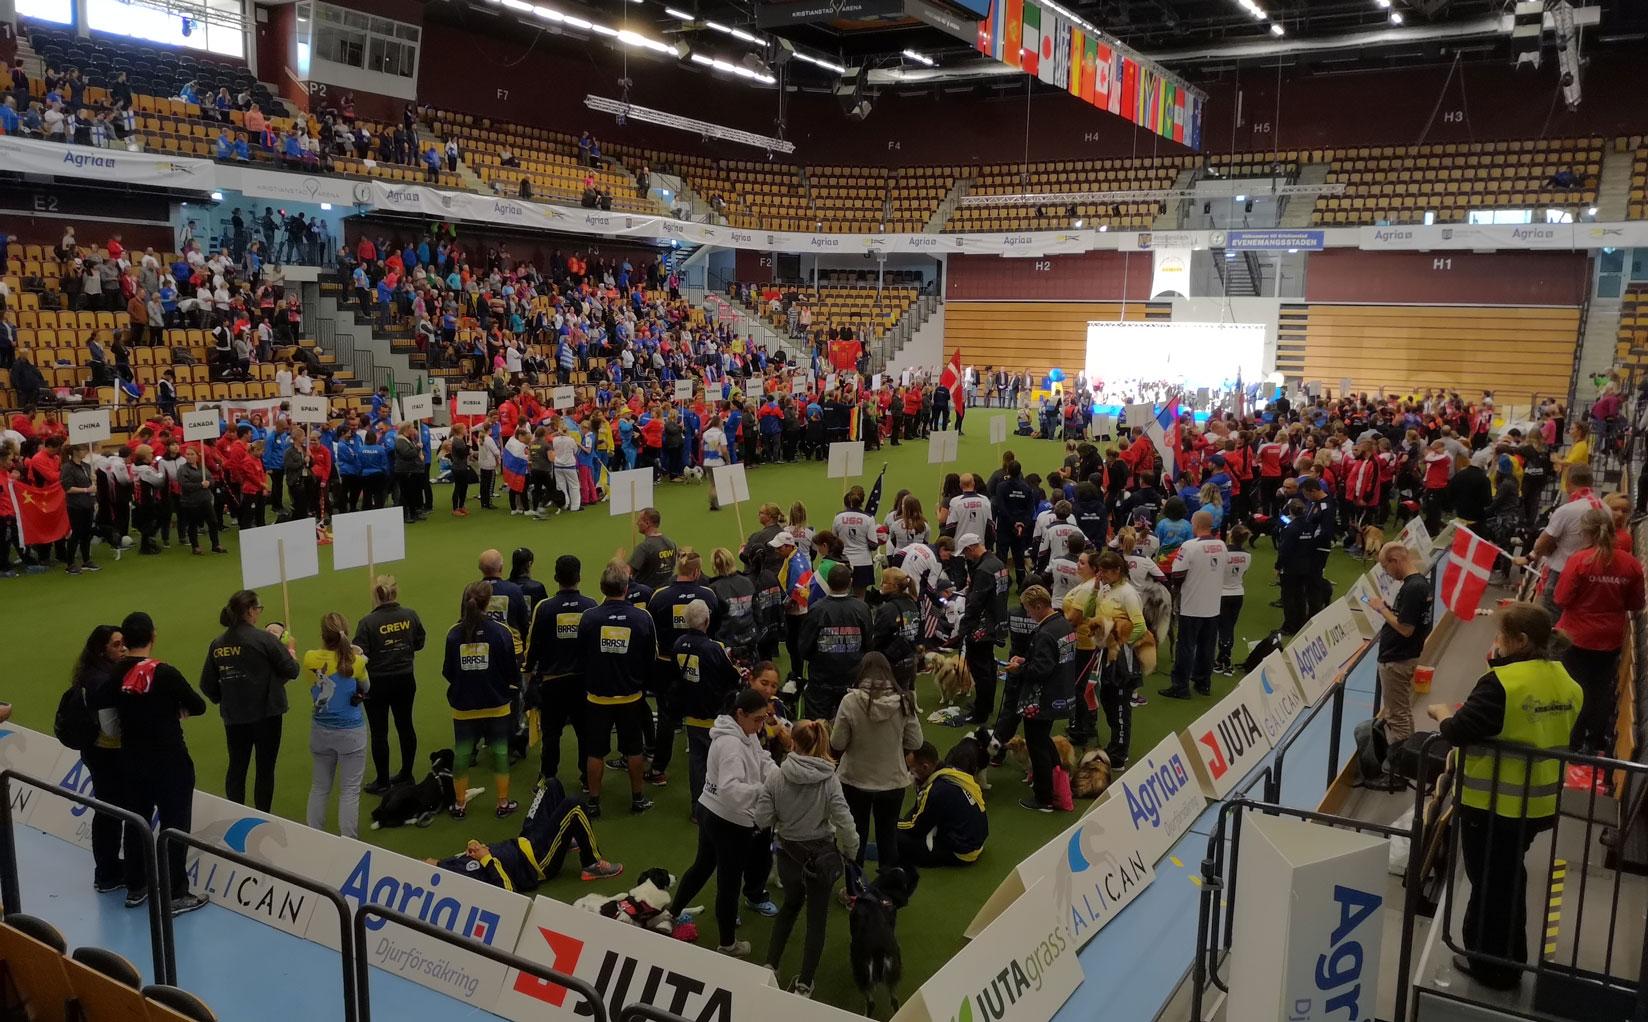 Agility-world-championships-2018-awc-analysed.jpg